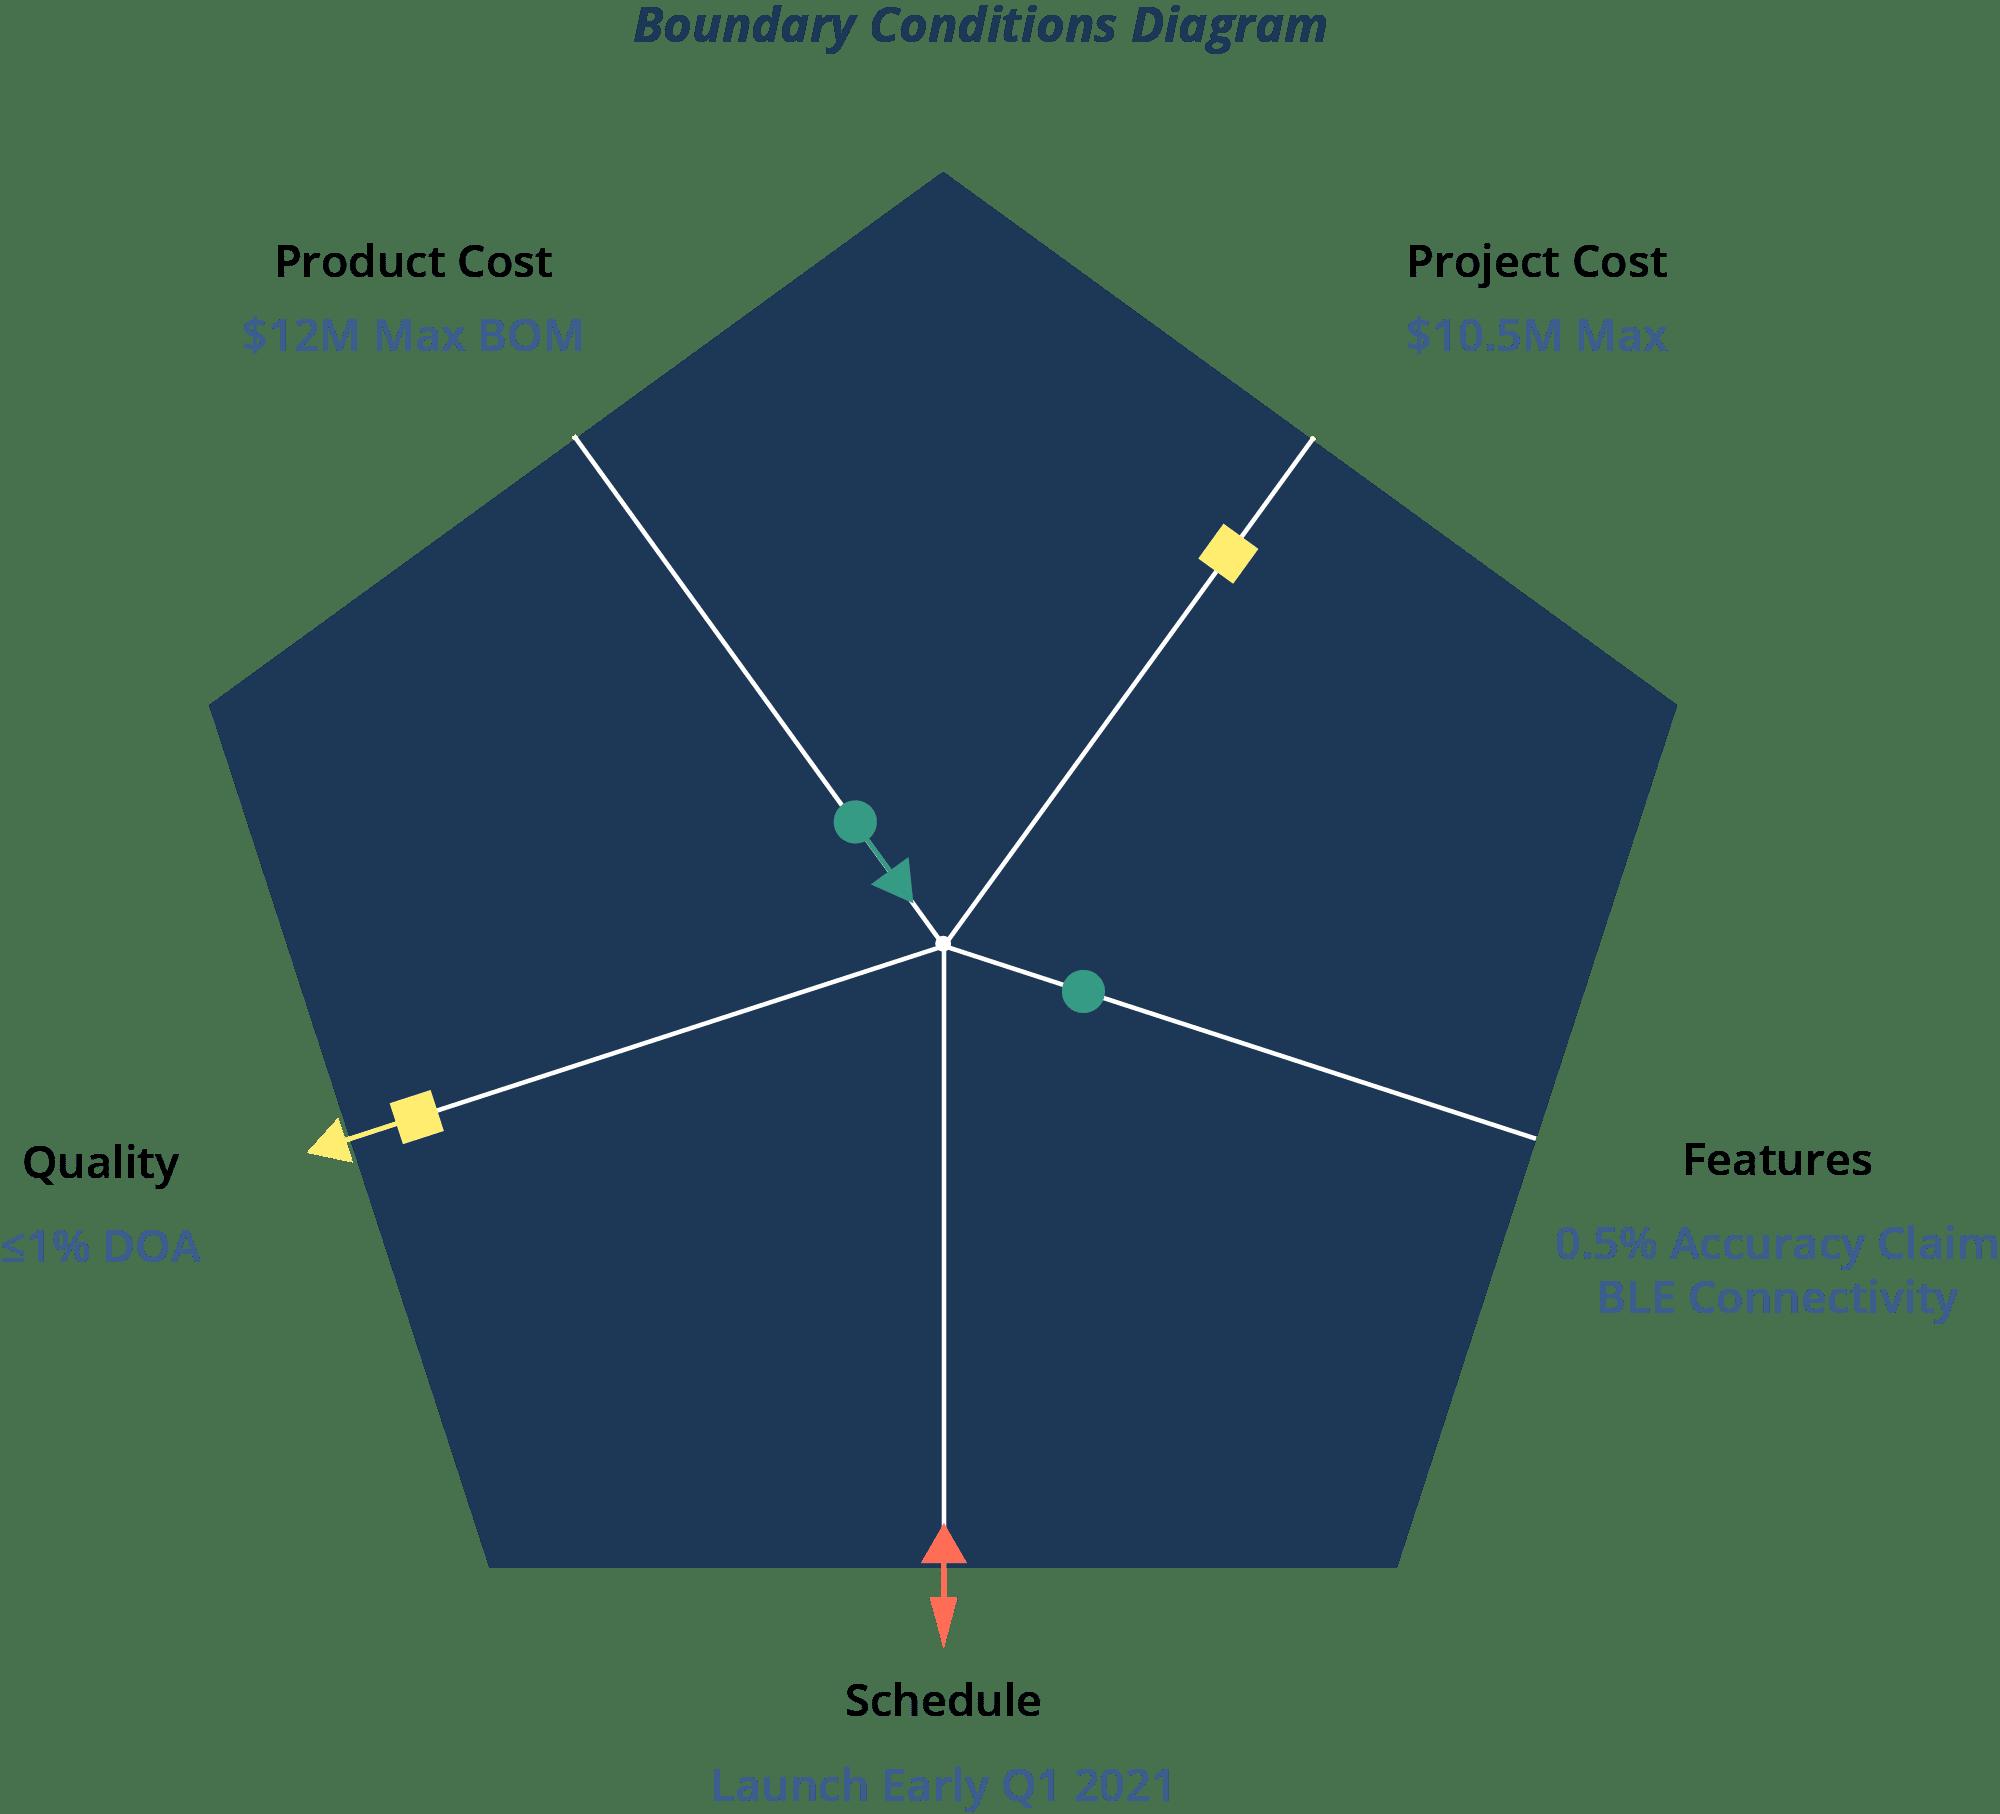 Boundary Conditions Diagram